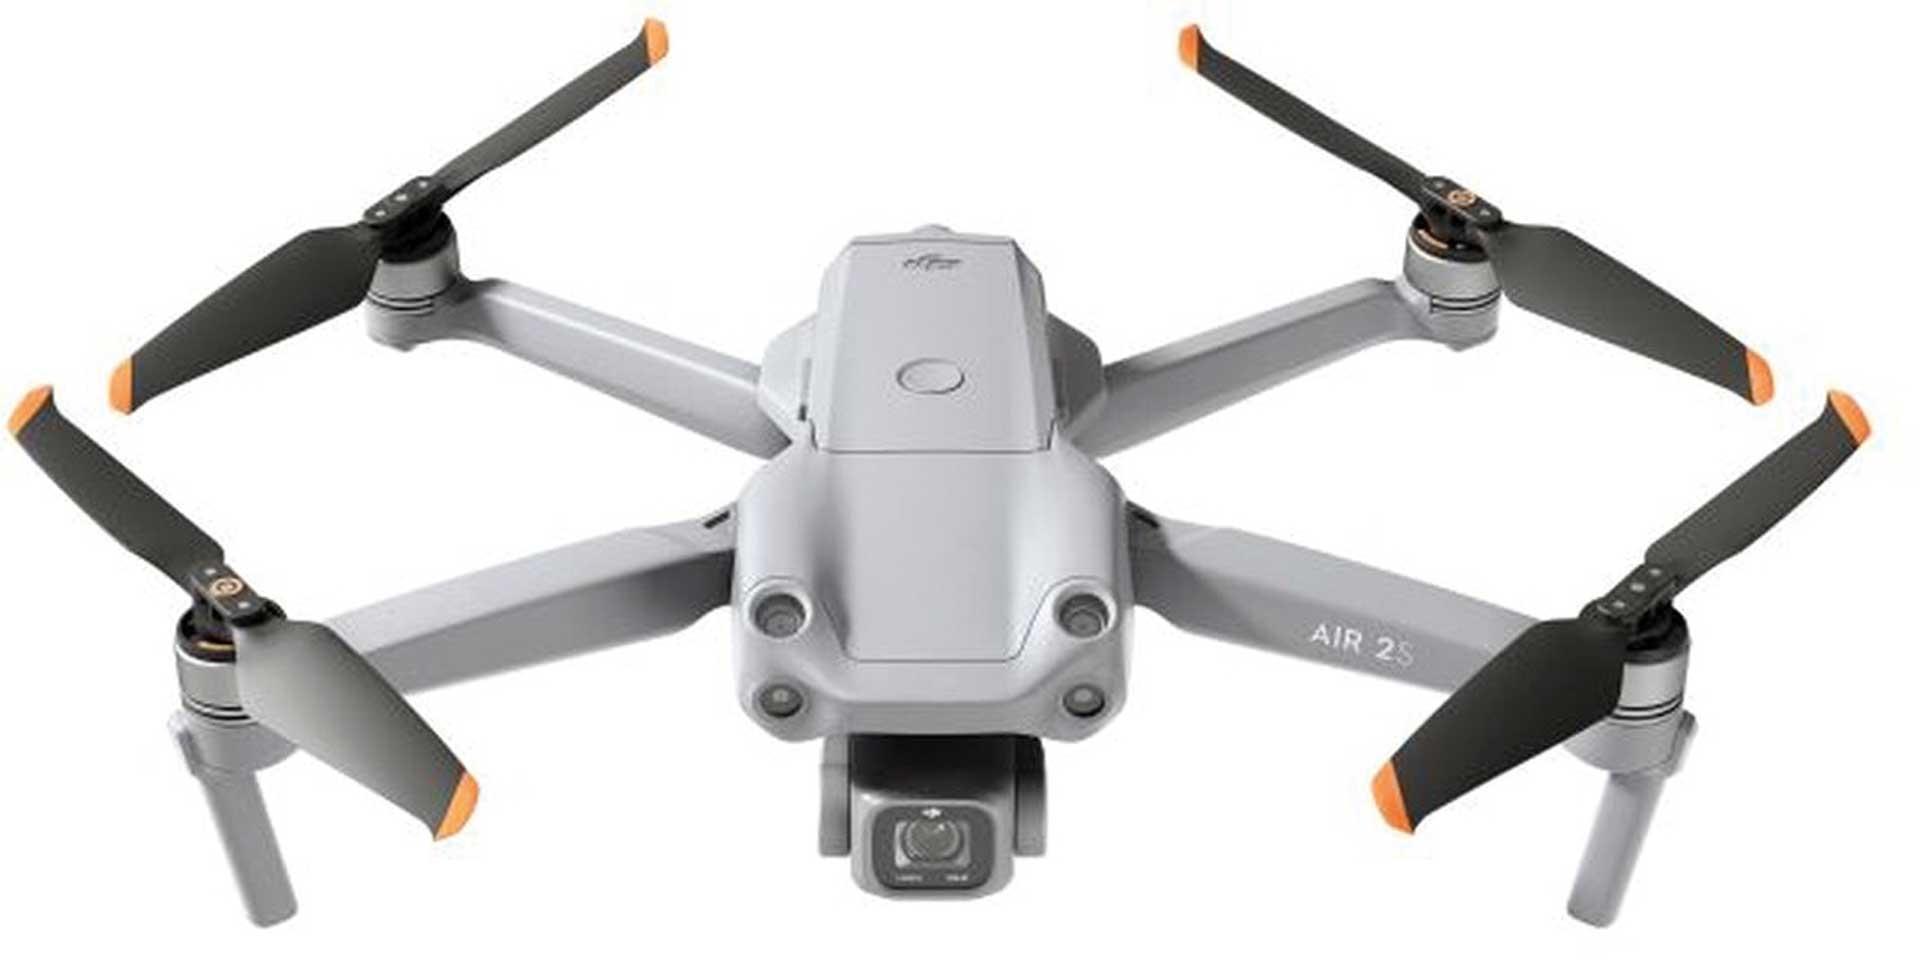 DJI AIR 2S Drohne Fly More Combo